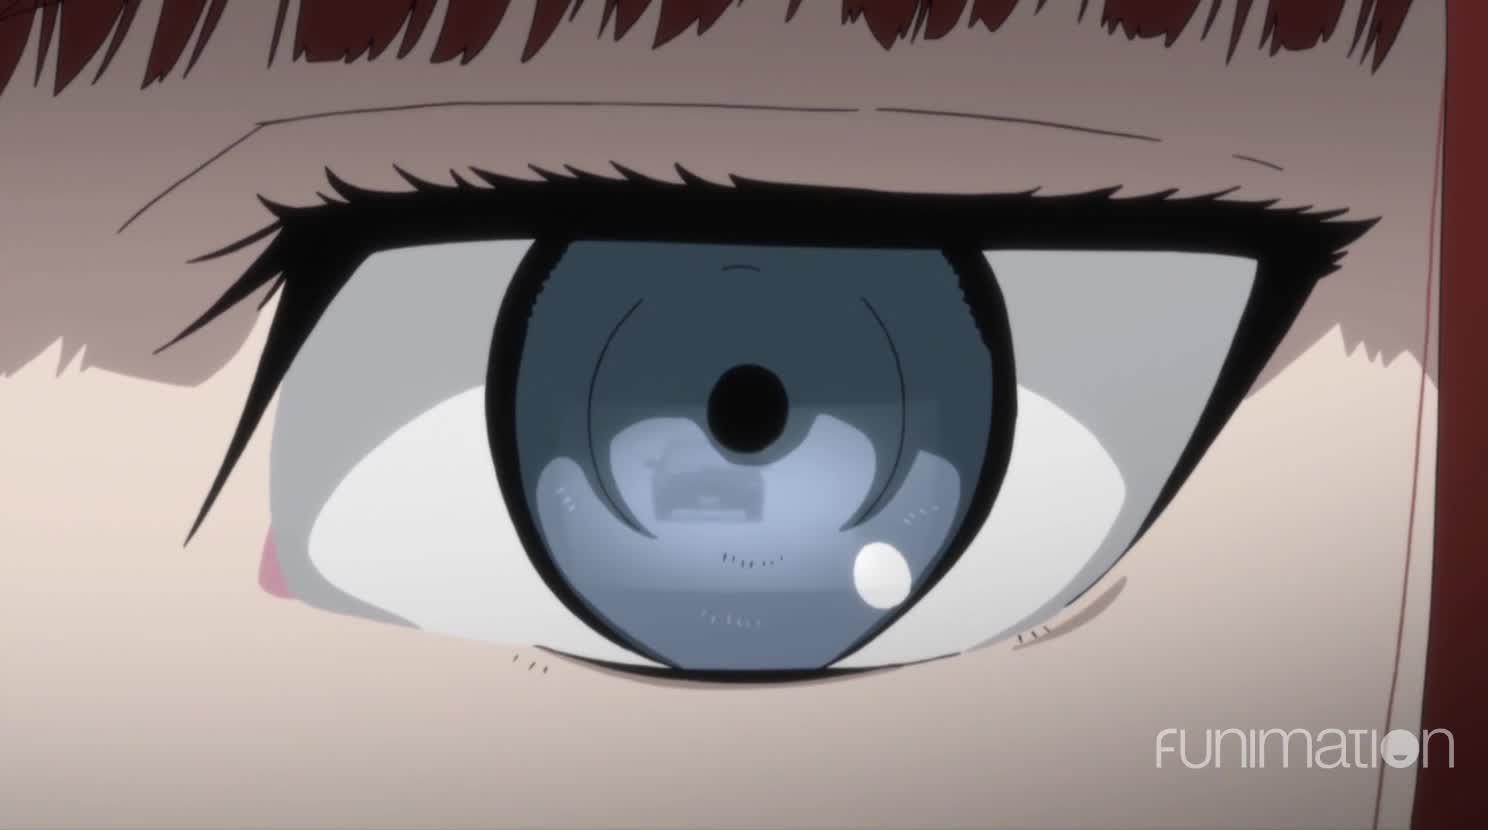 anime, funimation, sci-fi, scifi, steins gate, steins gate 0, steins;gate, steins;gate episode 11, steinsgate, steinsgate 0, fond memory GIFs